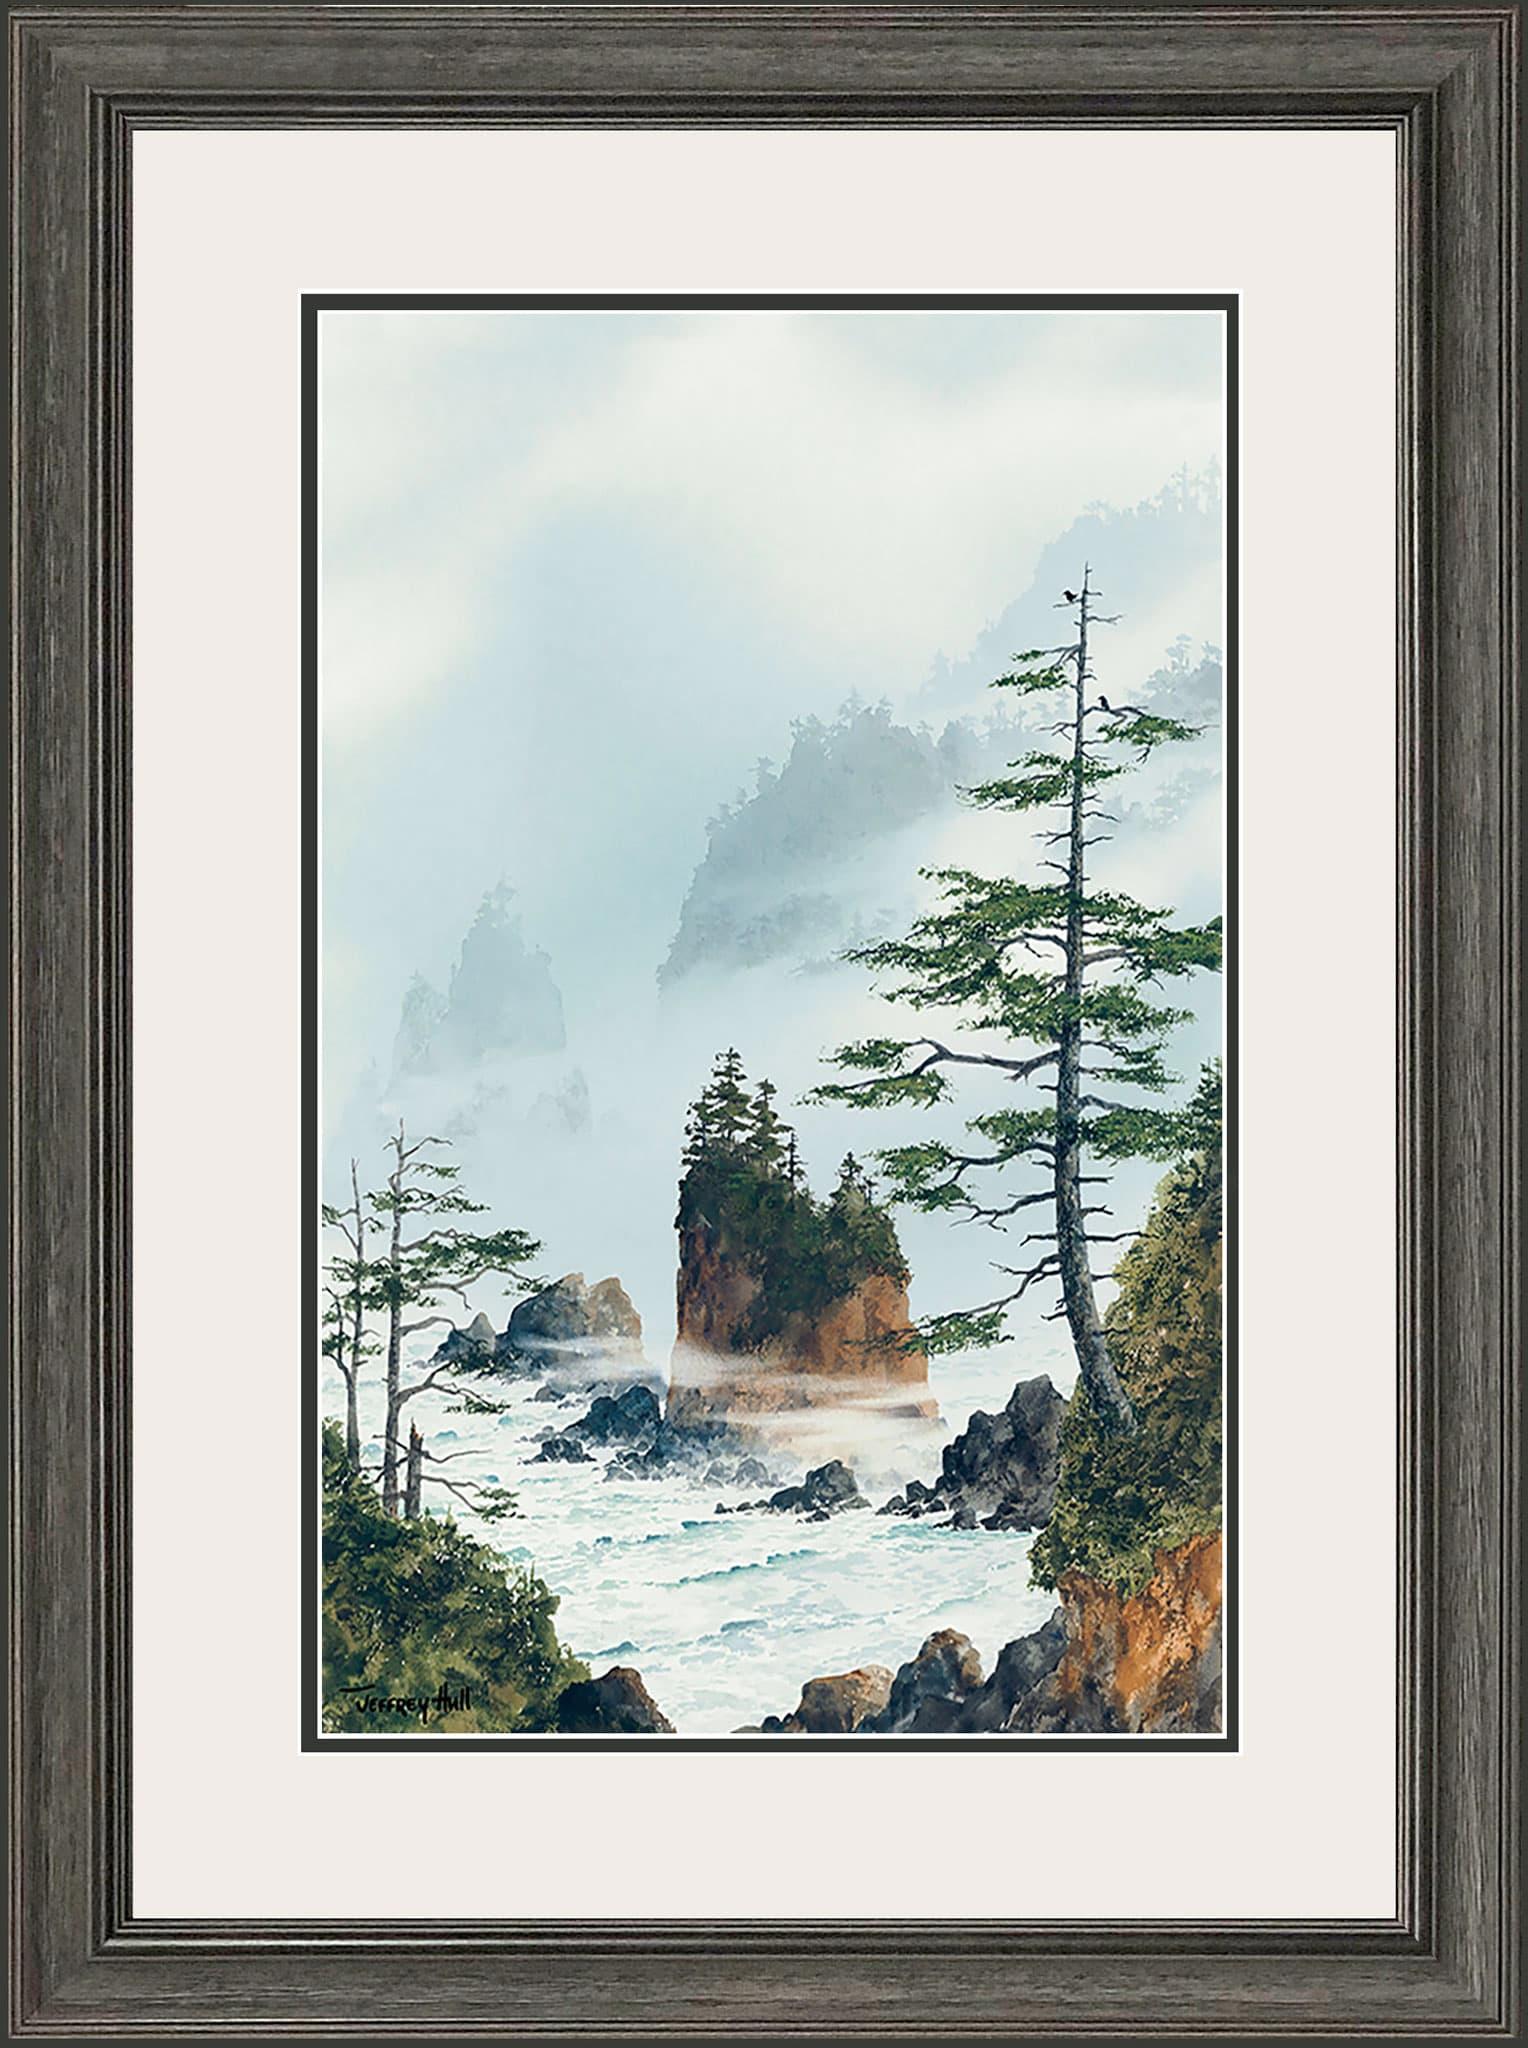 Foggy-Perch-LimEd-Cascade-Talc-Dark-Shale-4-Website-2021